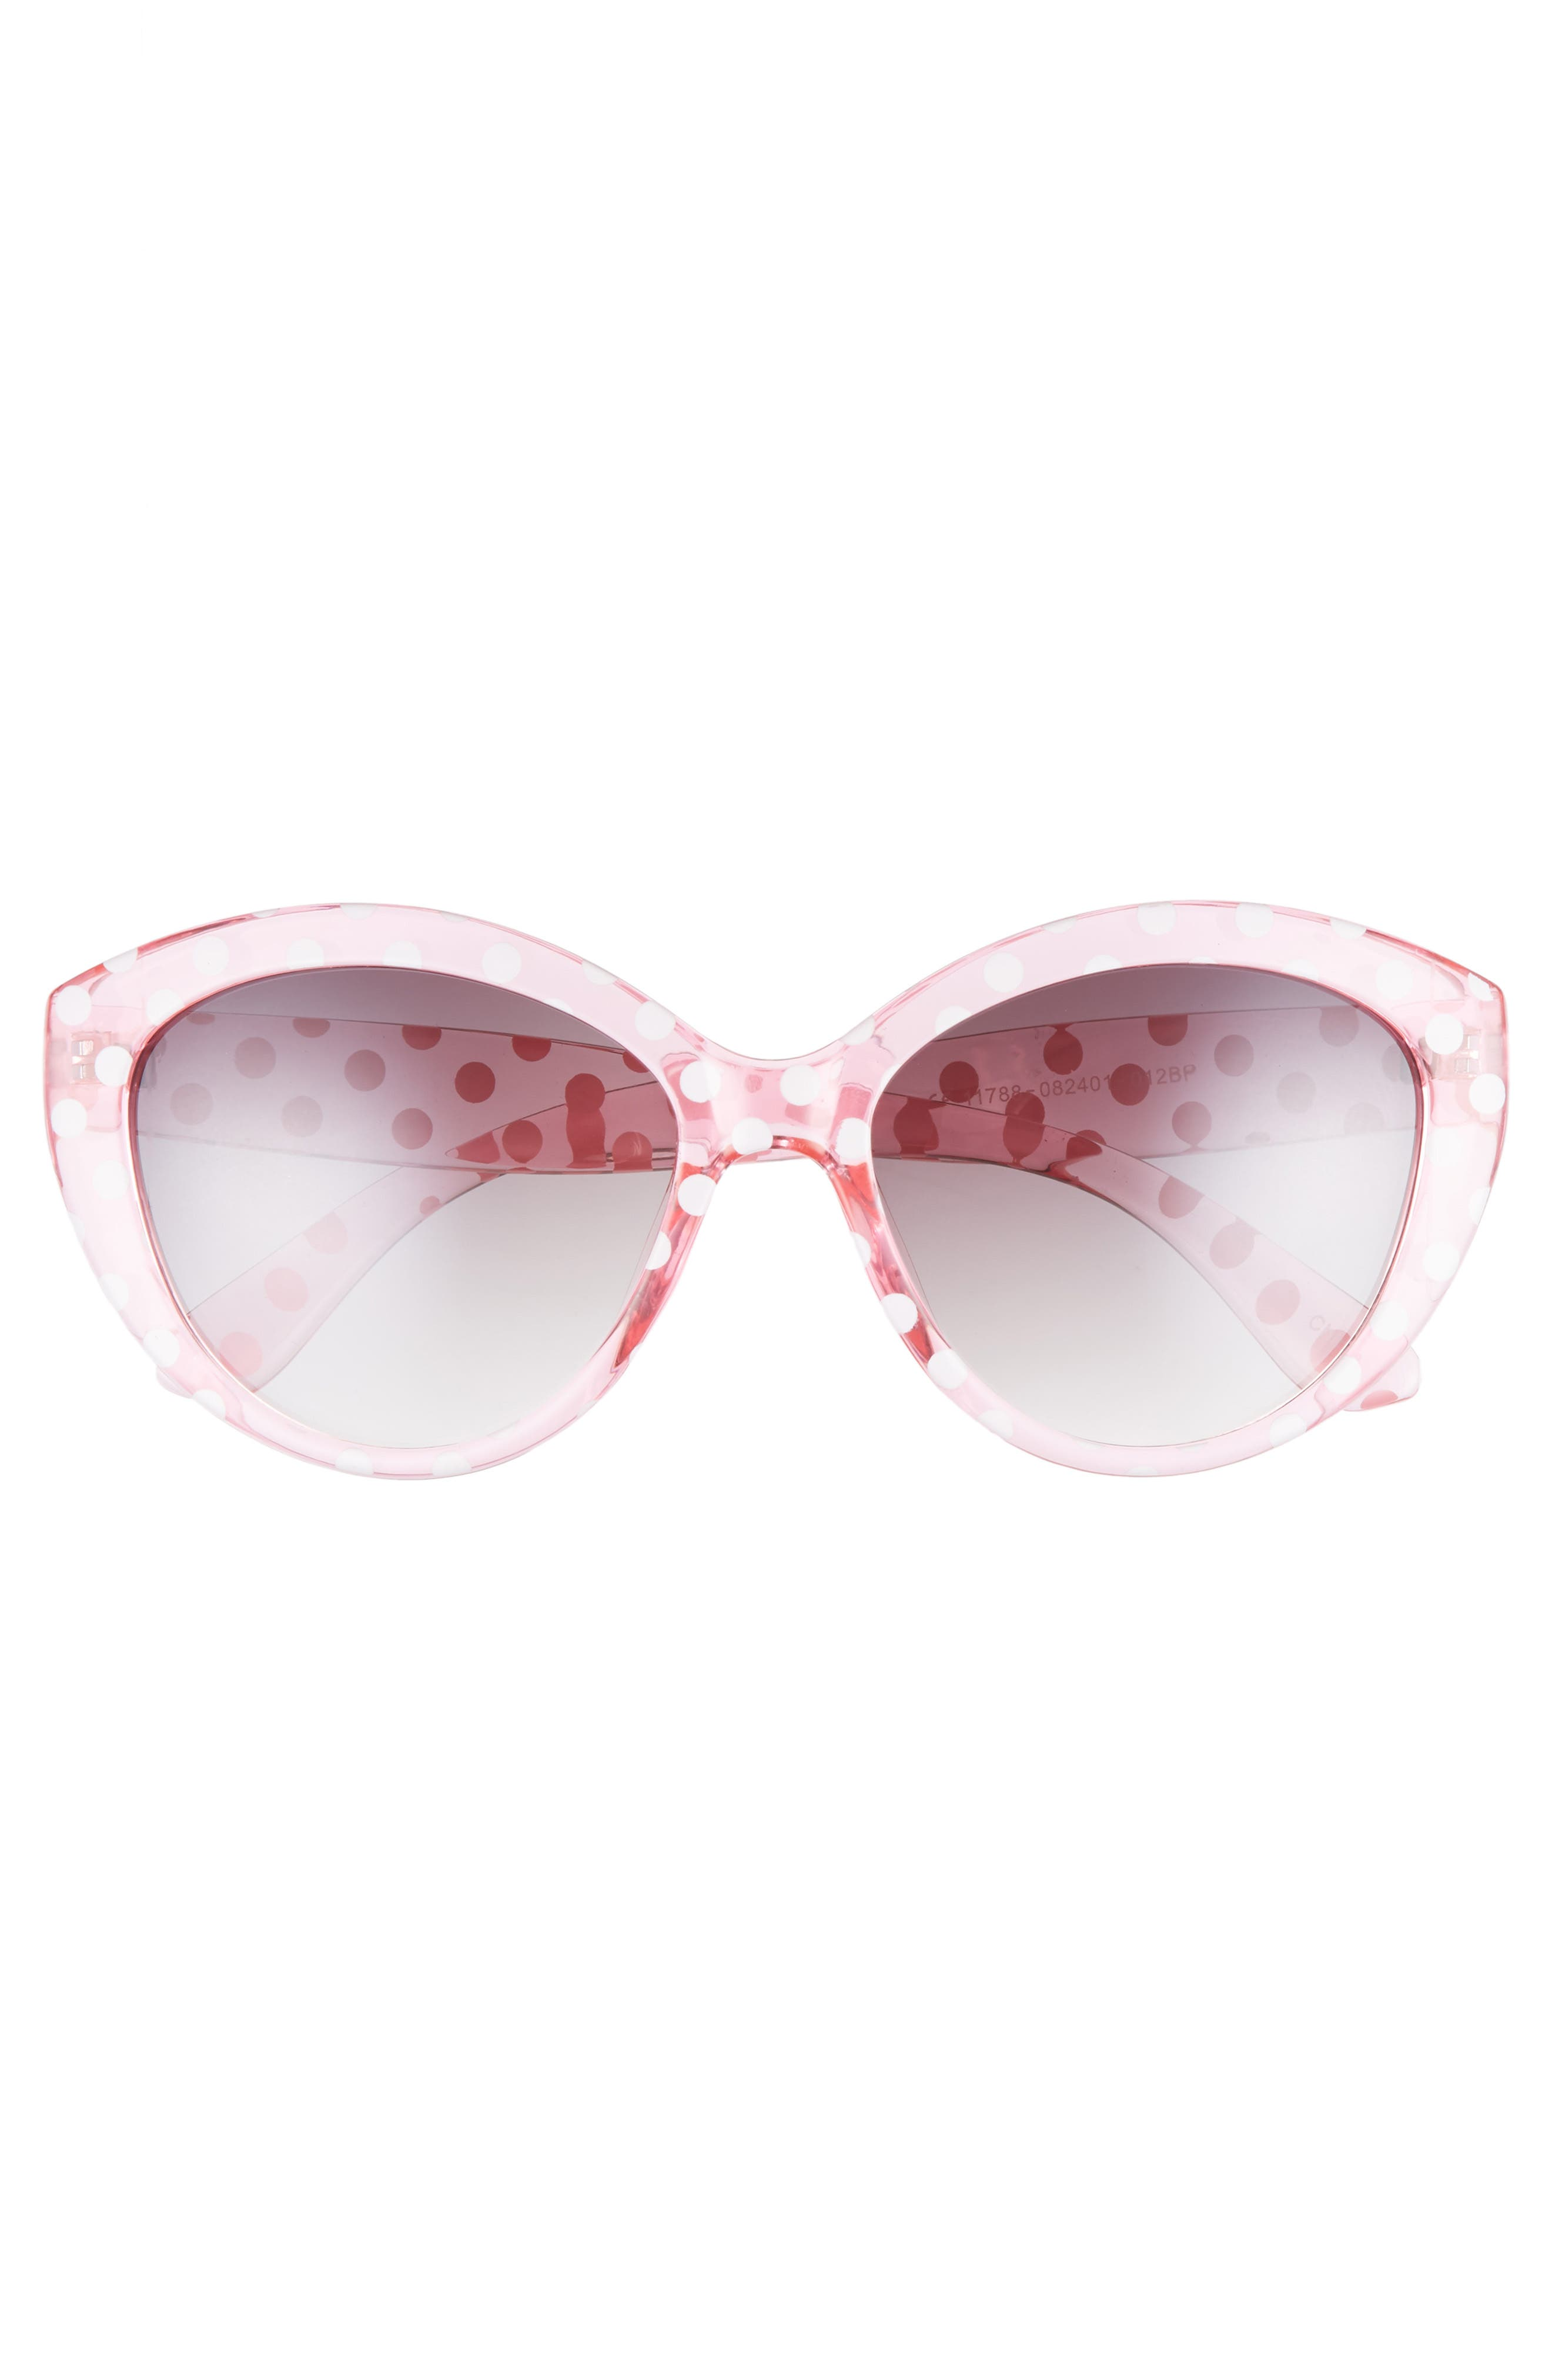 55mm Translucent Polka Dot Cat Eye Sunglasses,                             Alternate thumbnail 3, color,                             PINK/ BLACK